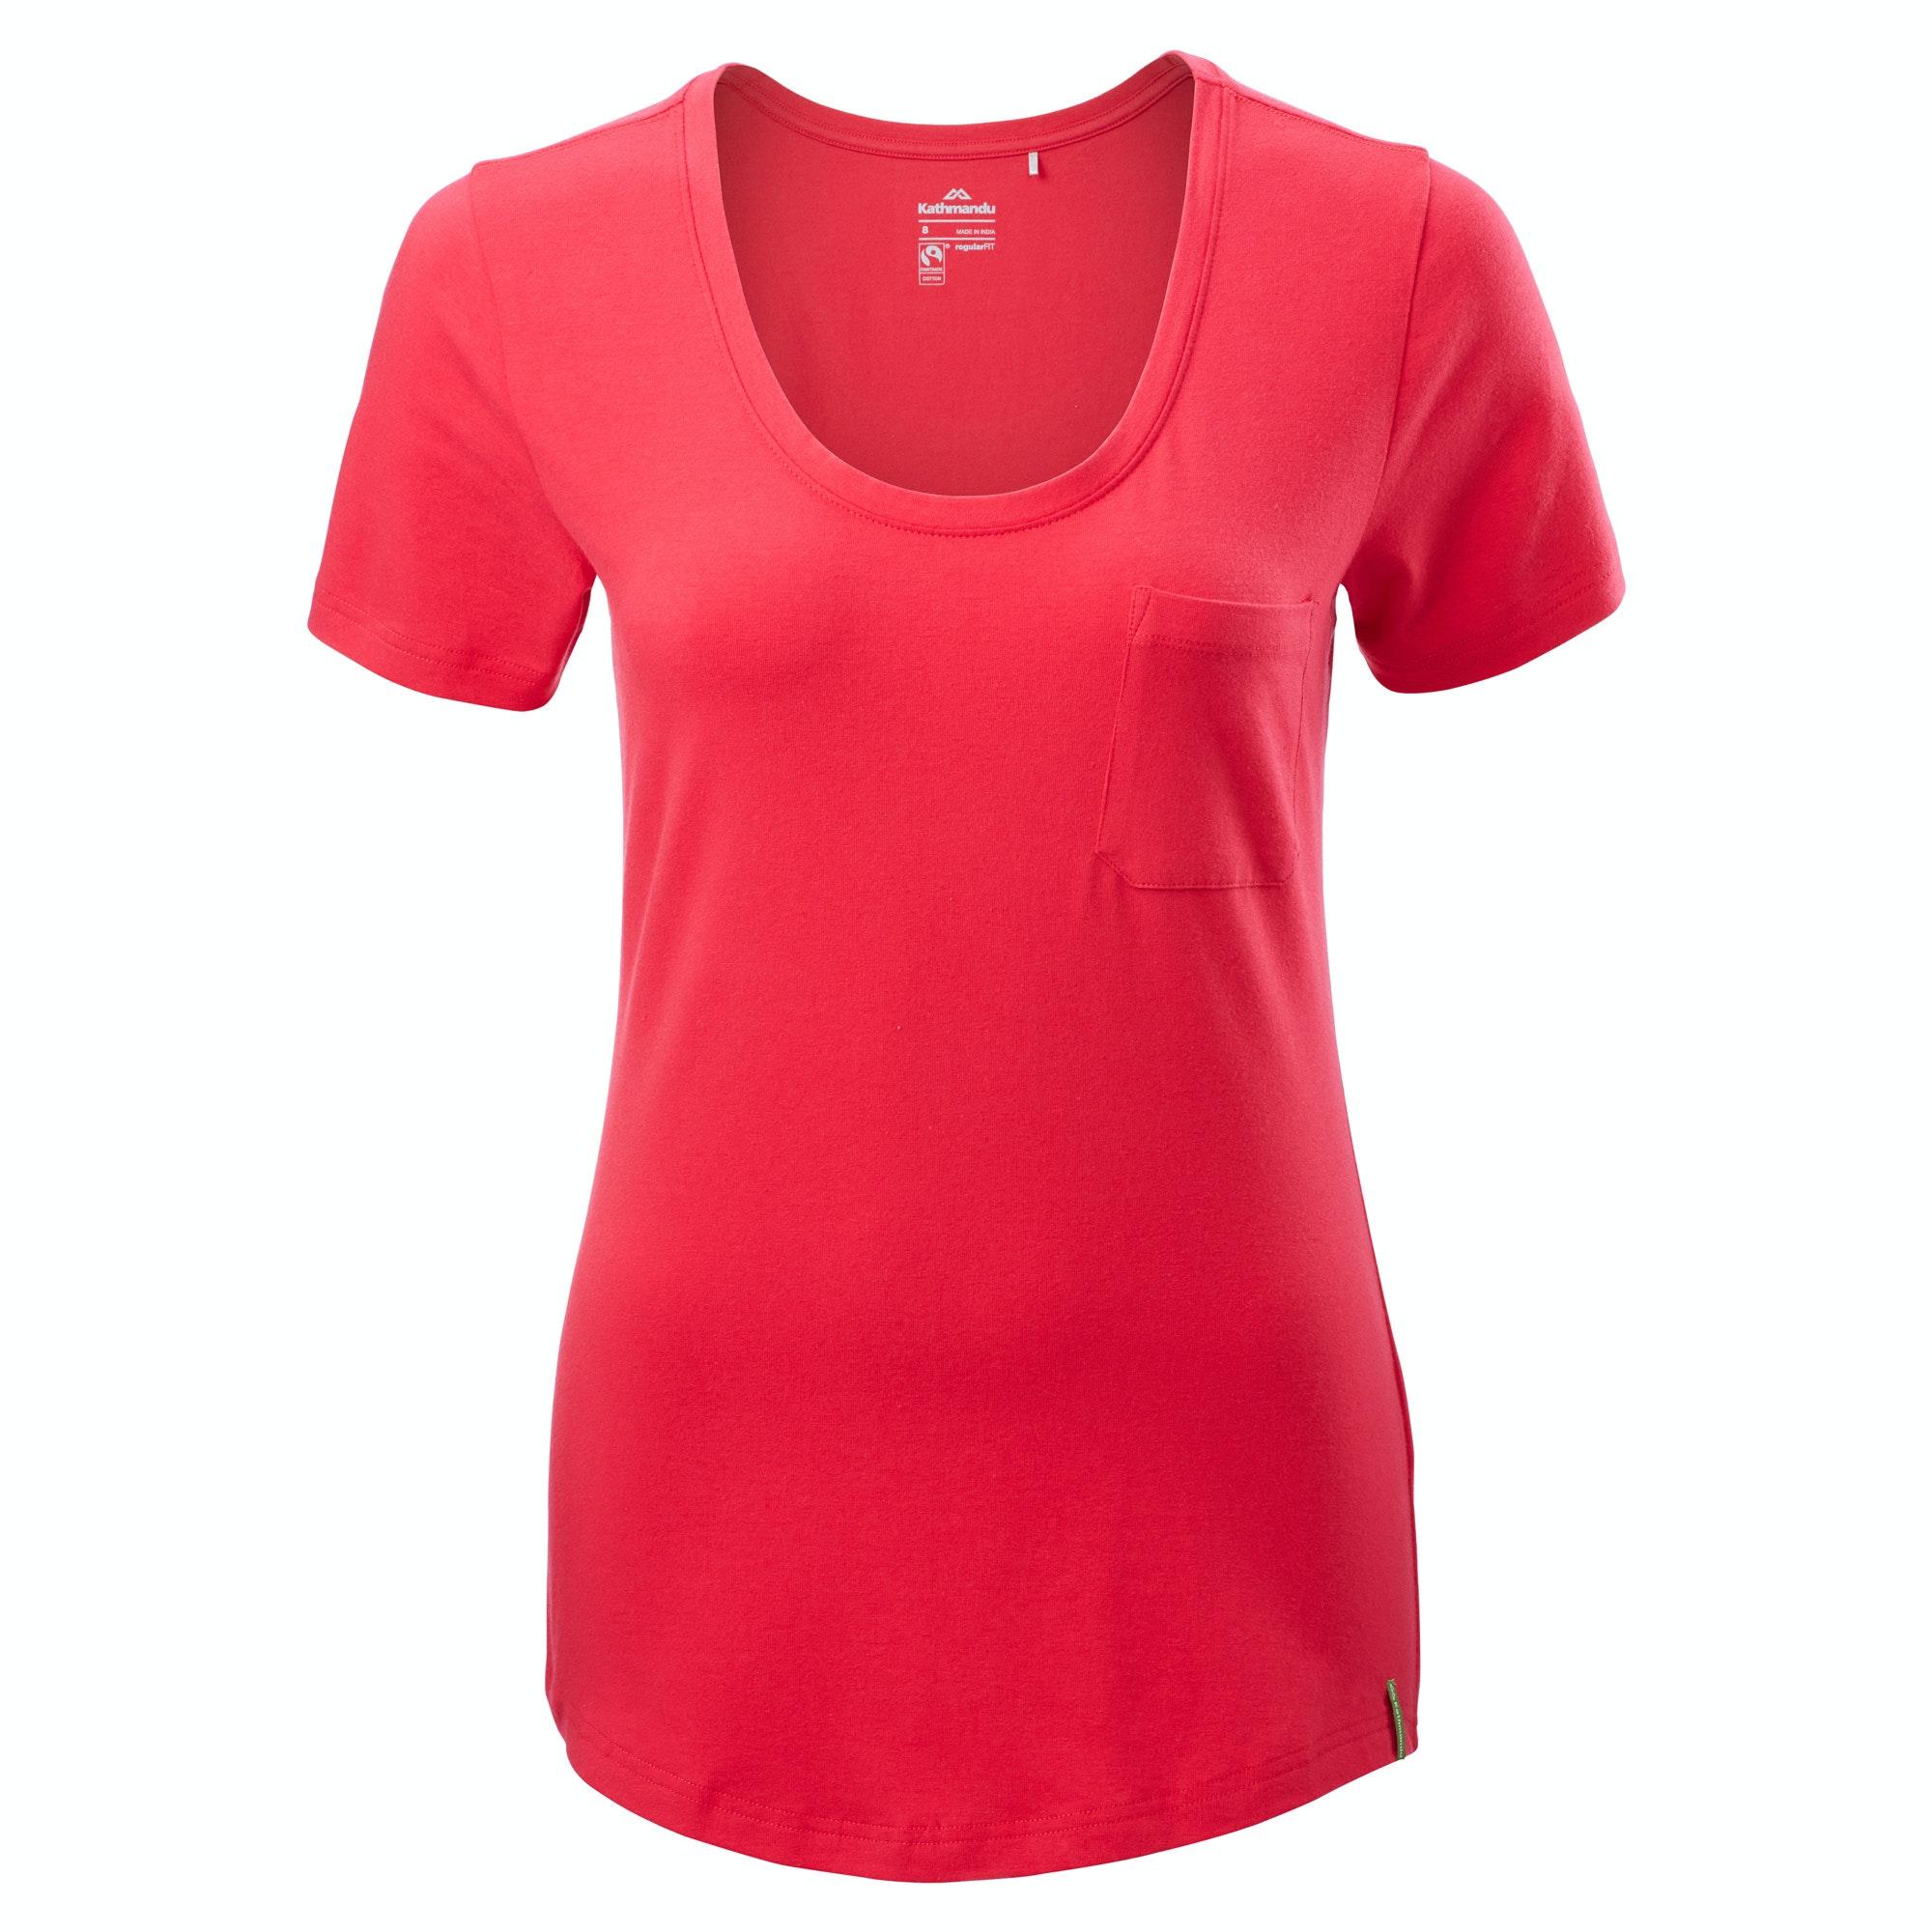 Kathmandu fairtrade womens organic cotton tee short sleeve for Staples custom t shirts